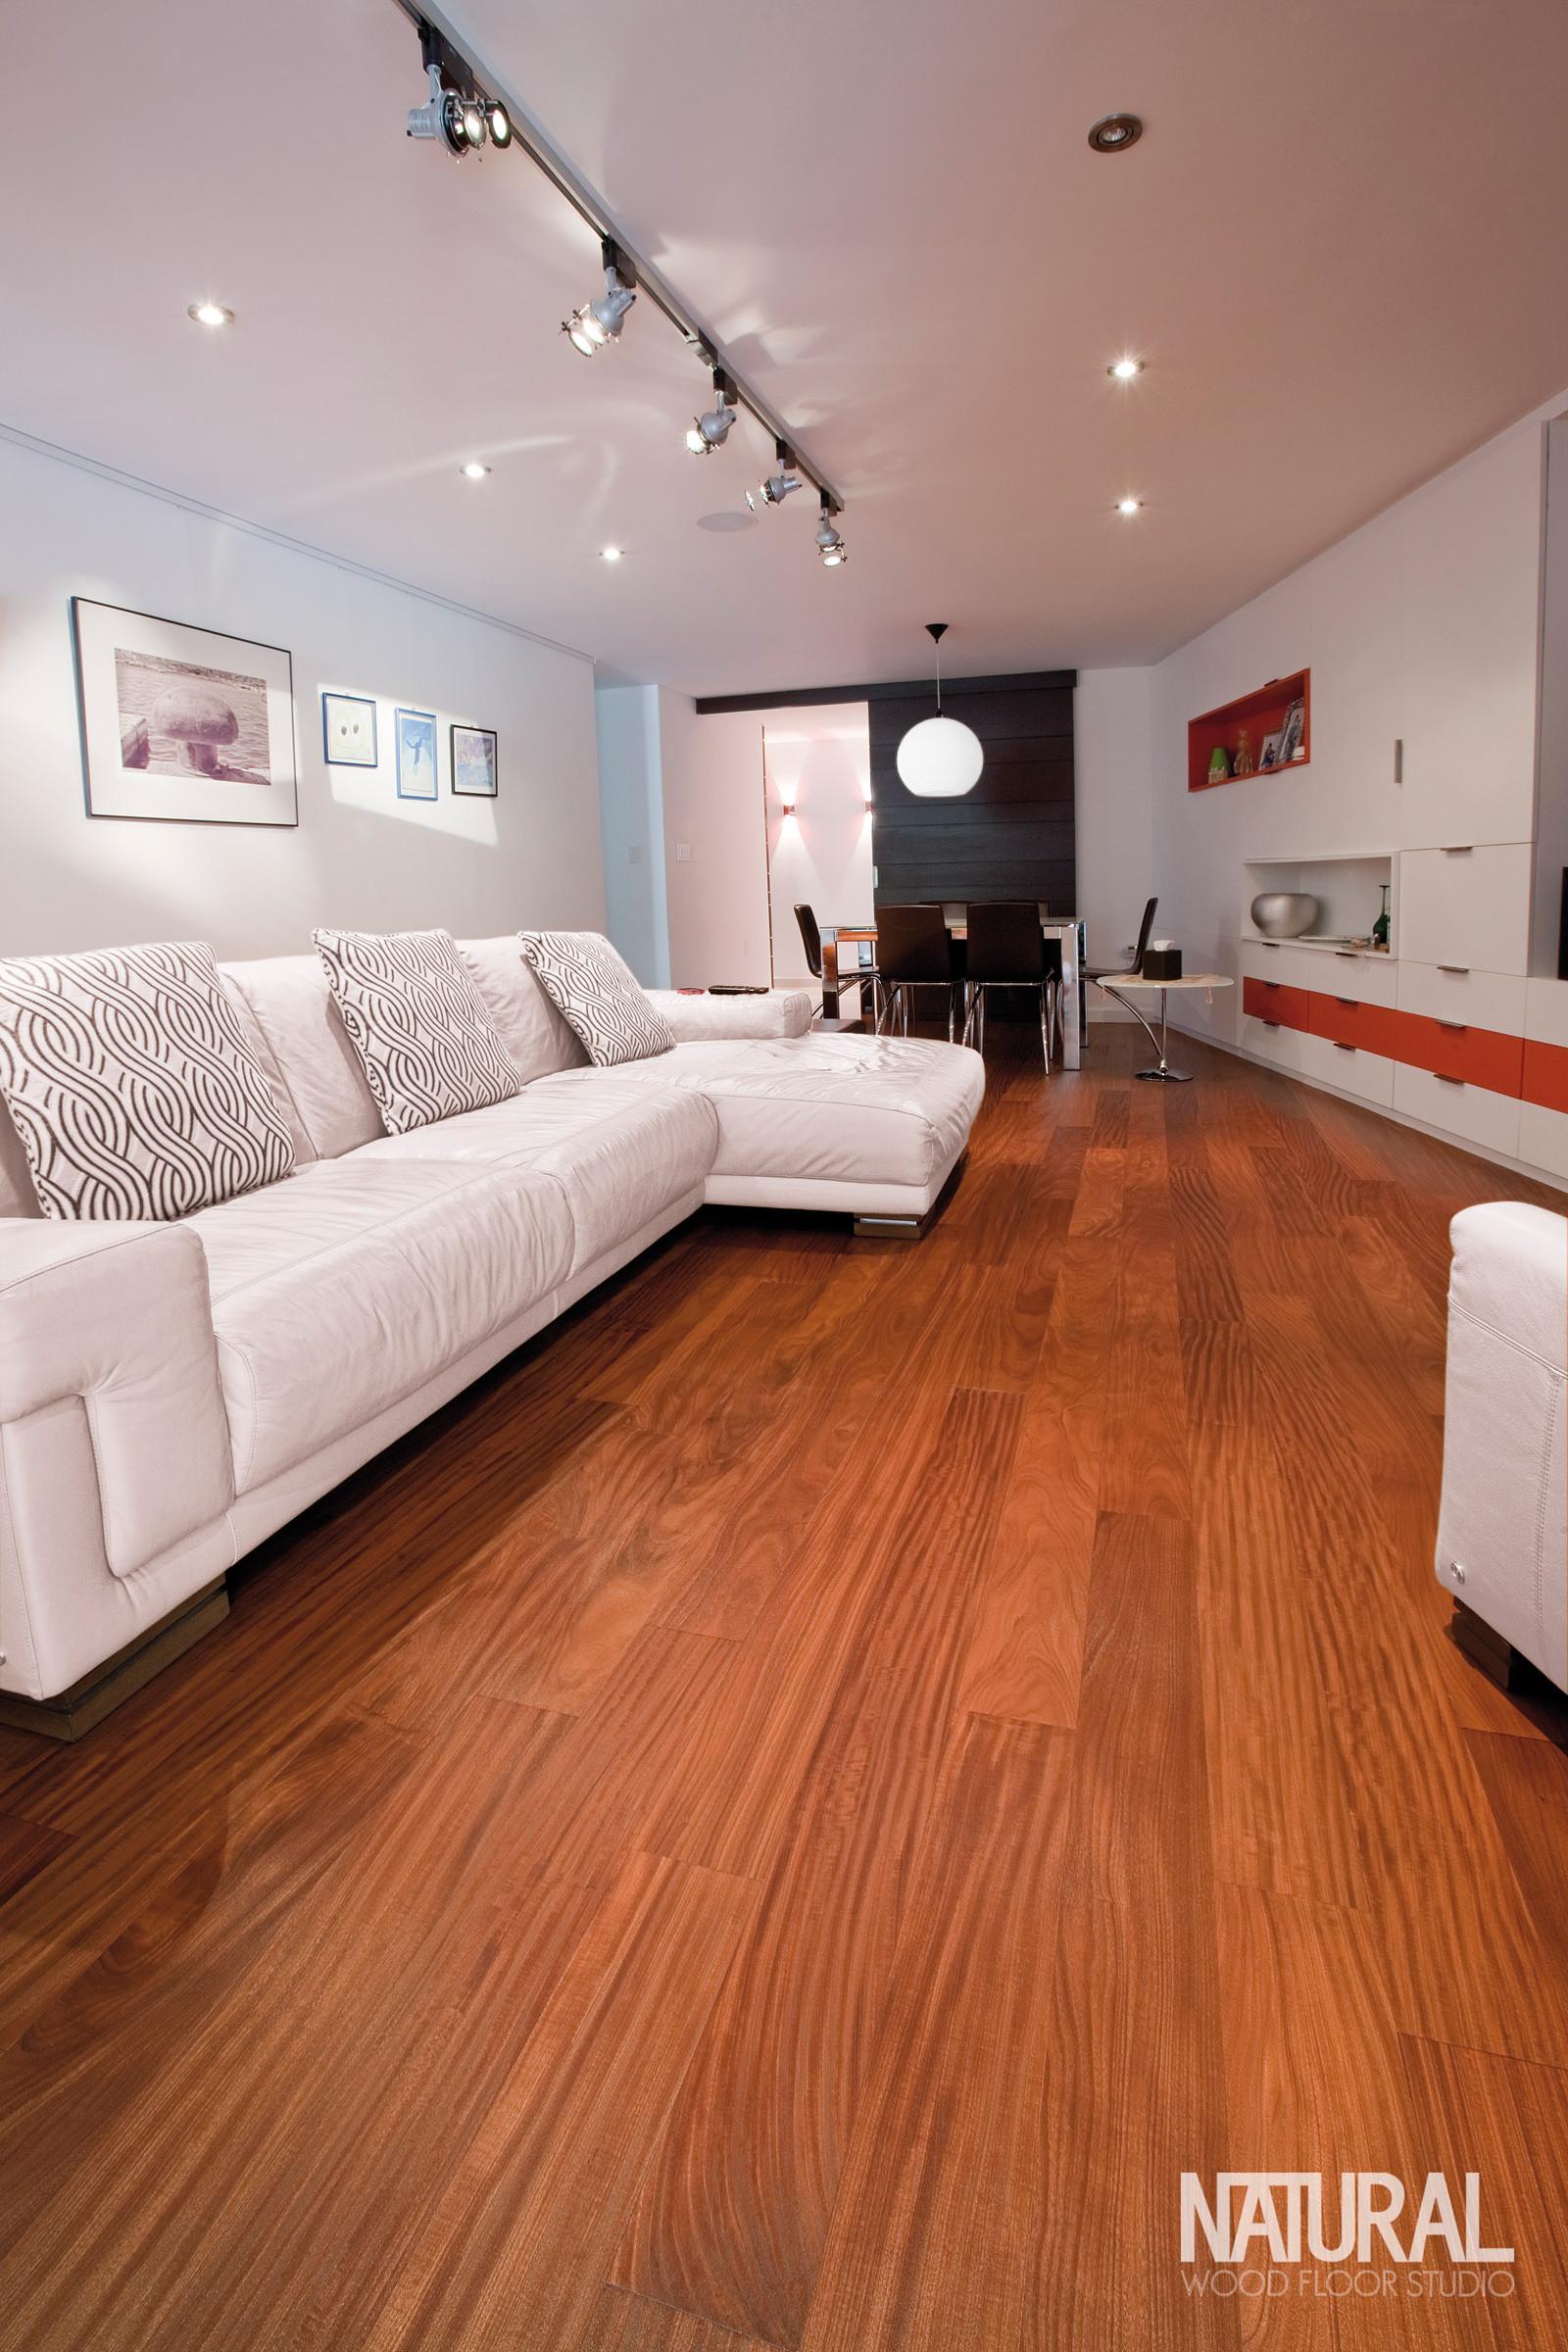 wenge hardwood flooring for sale of natural wood floor studio the fine art of wood floors throughout design